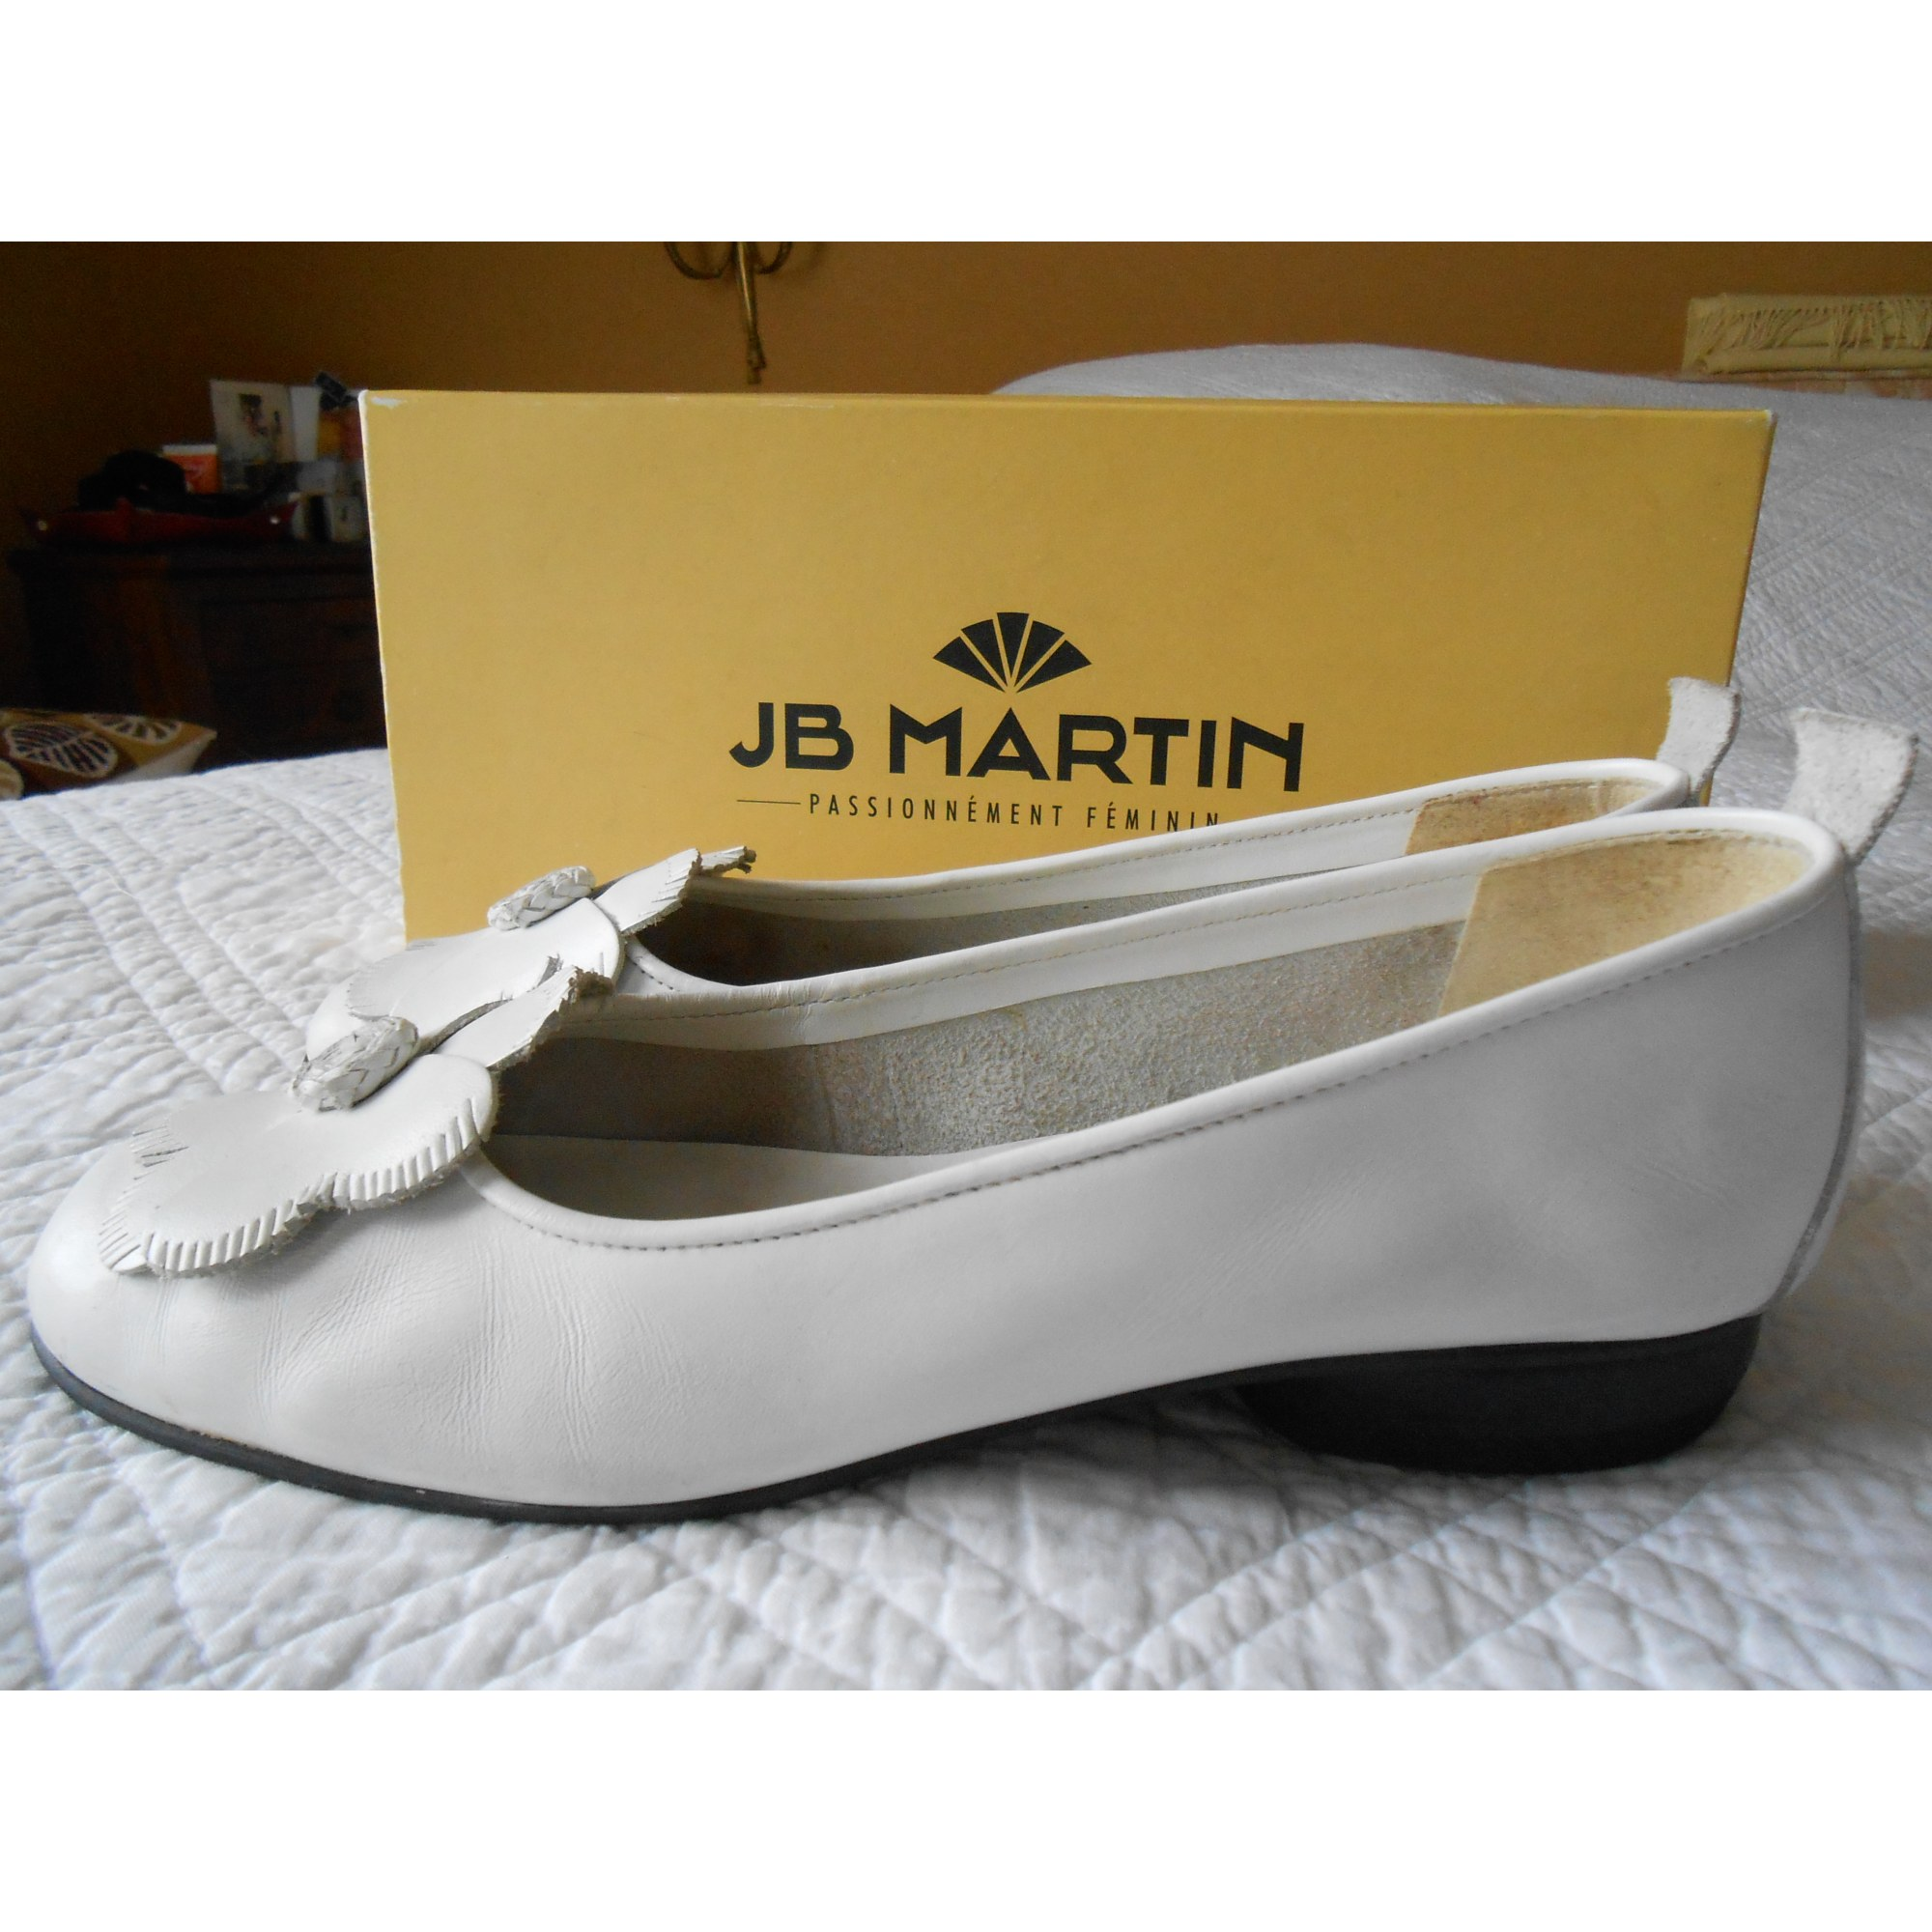 7d9a684188a6a Ballerines JB MARTIN 39 blanc - 7478477